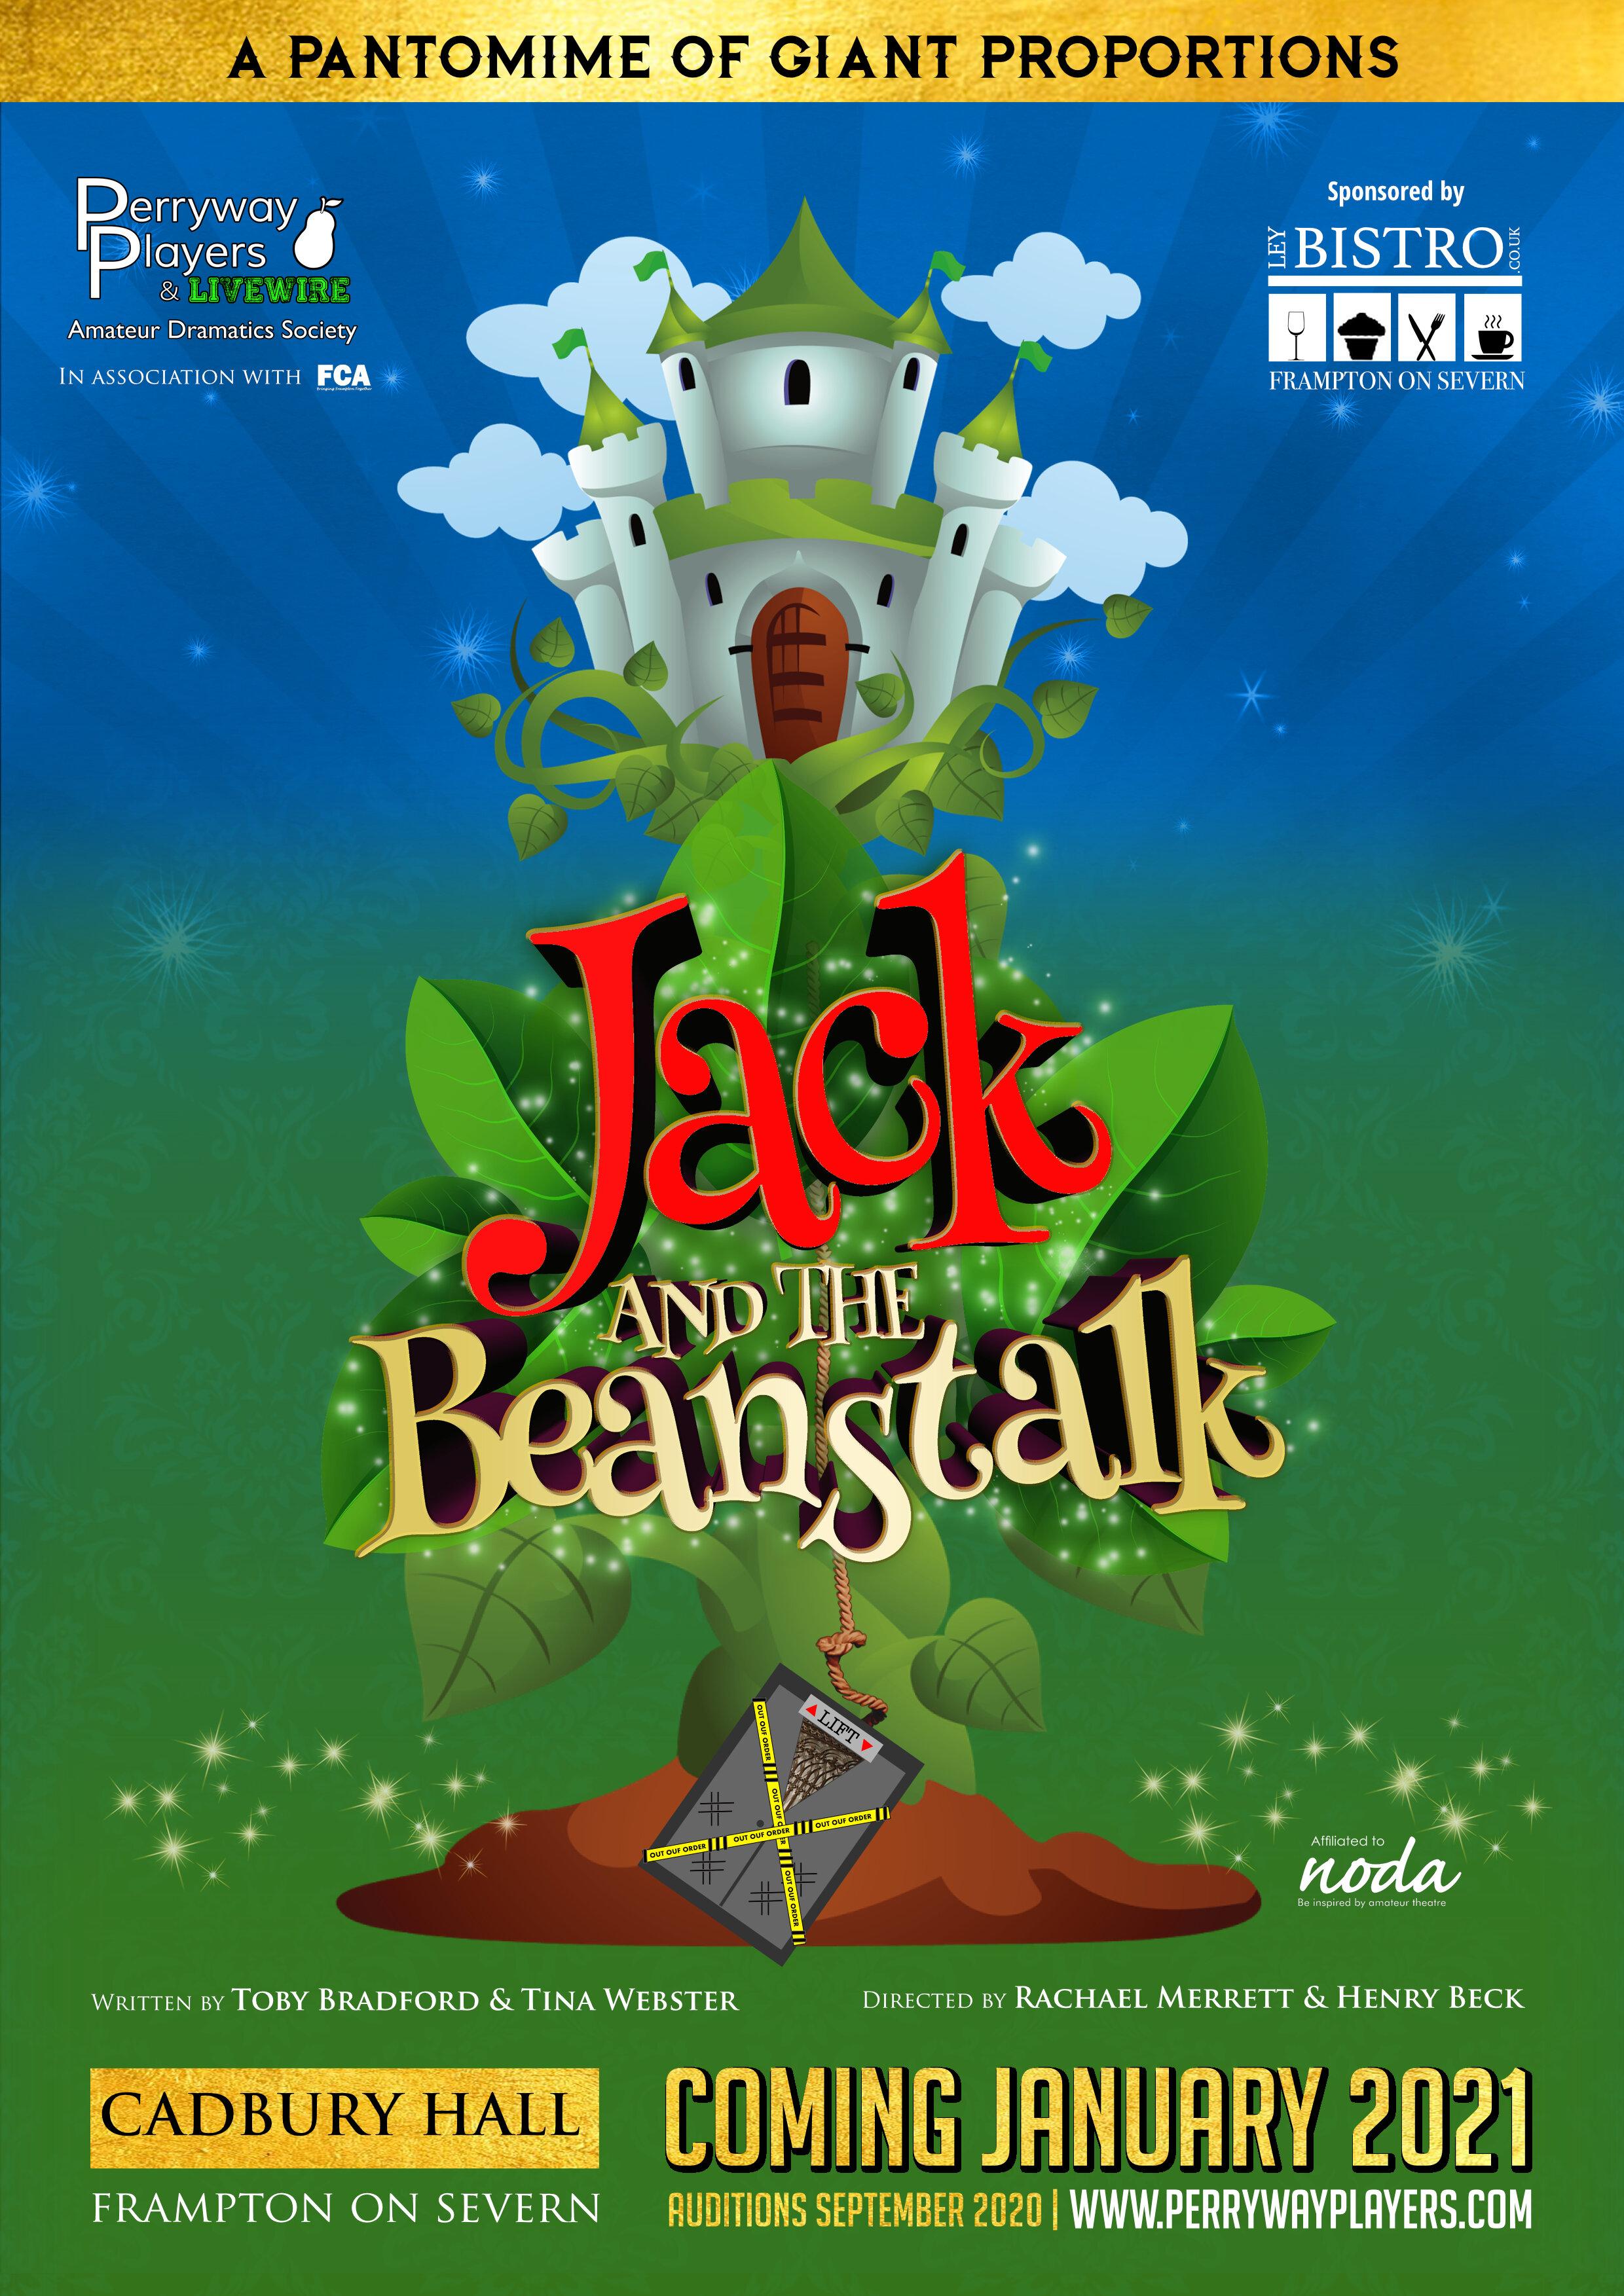 Jack and the Beanstalk cartoon RED.jpg